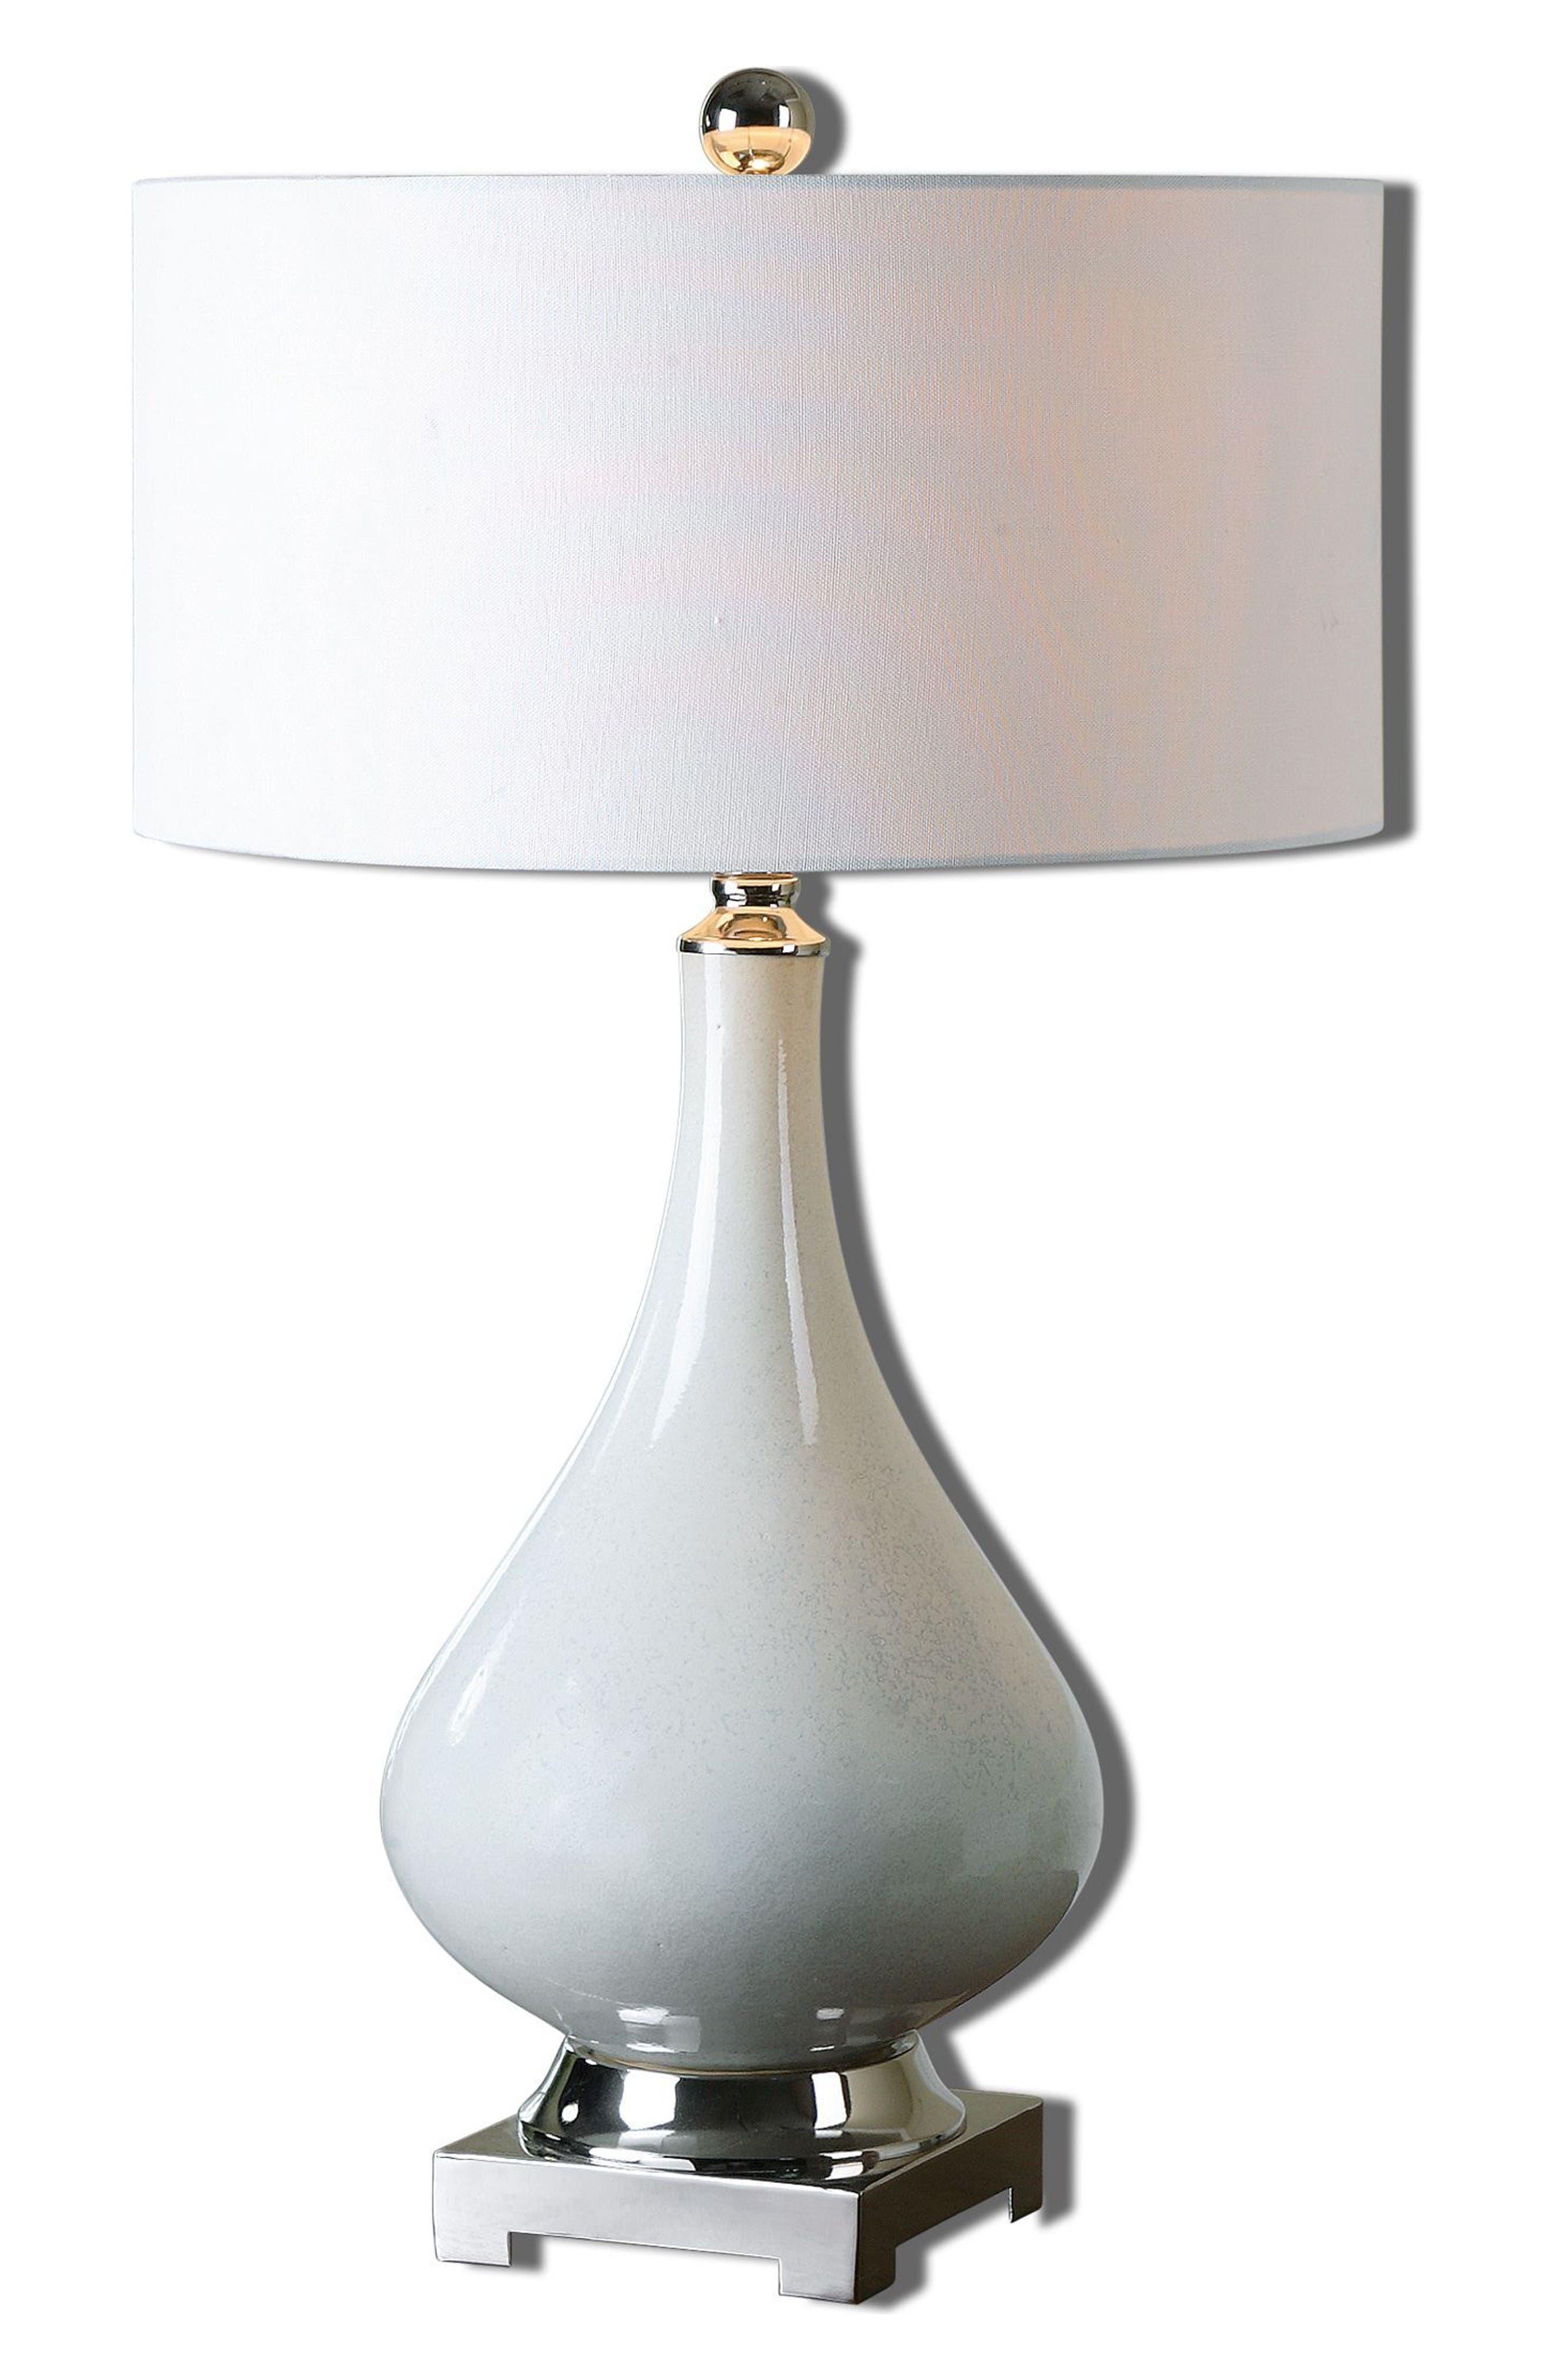 Main Image - Uttermost Helton Table Lamp